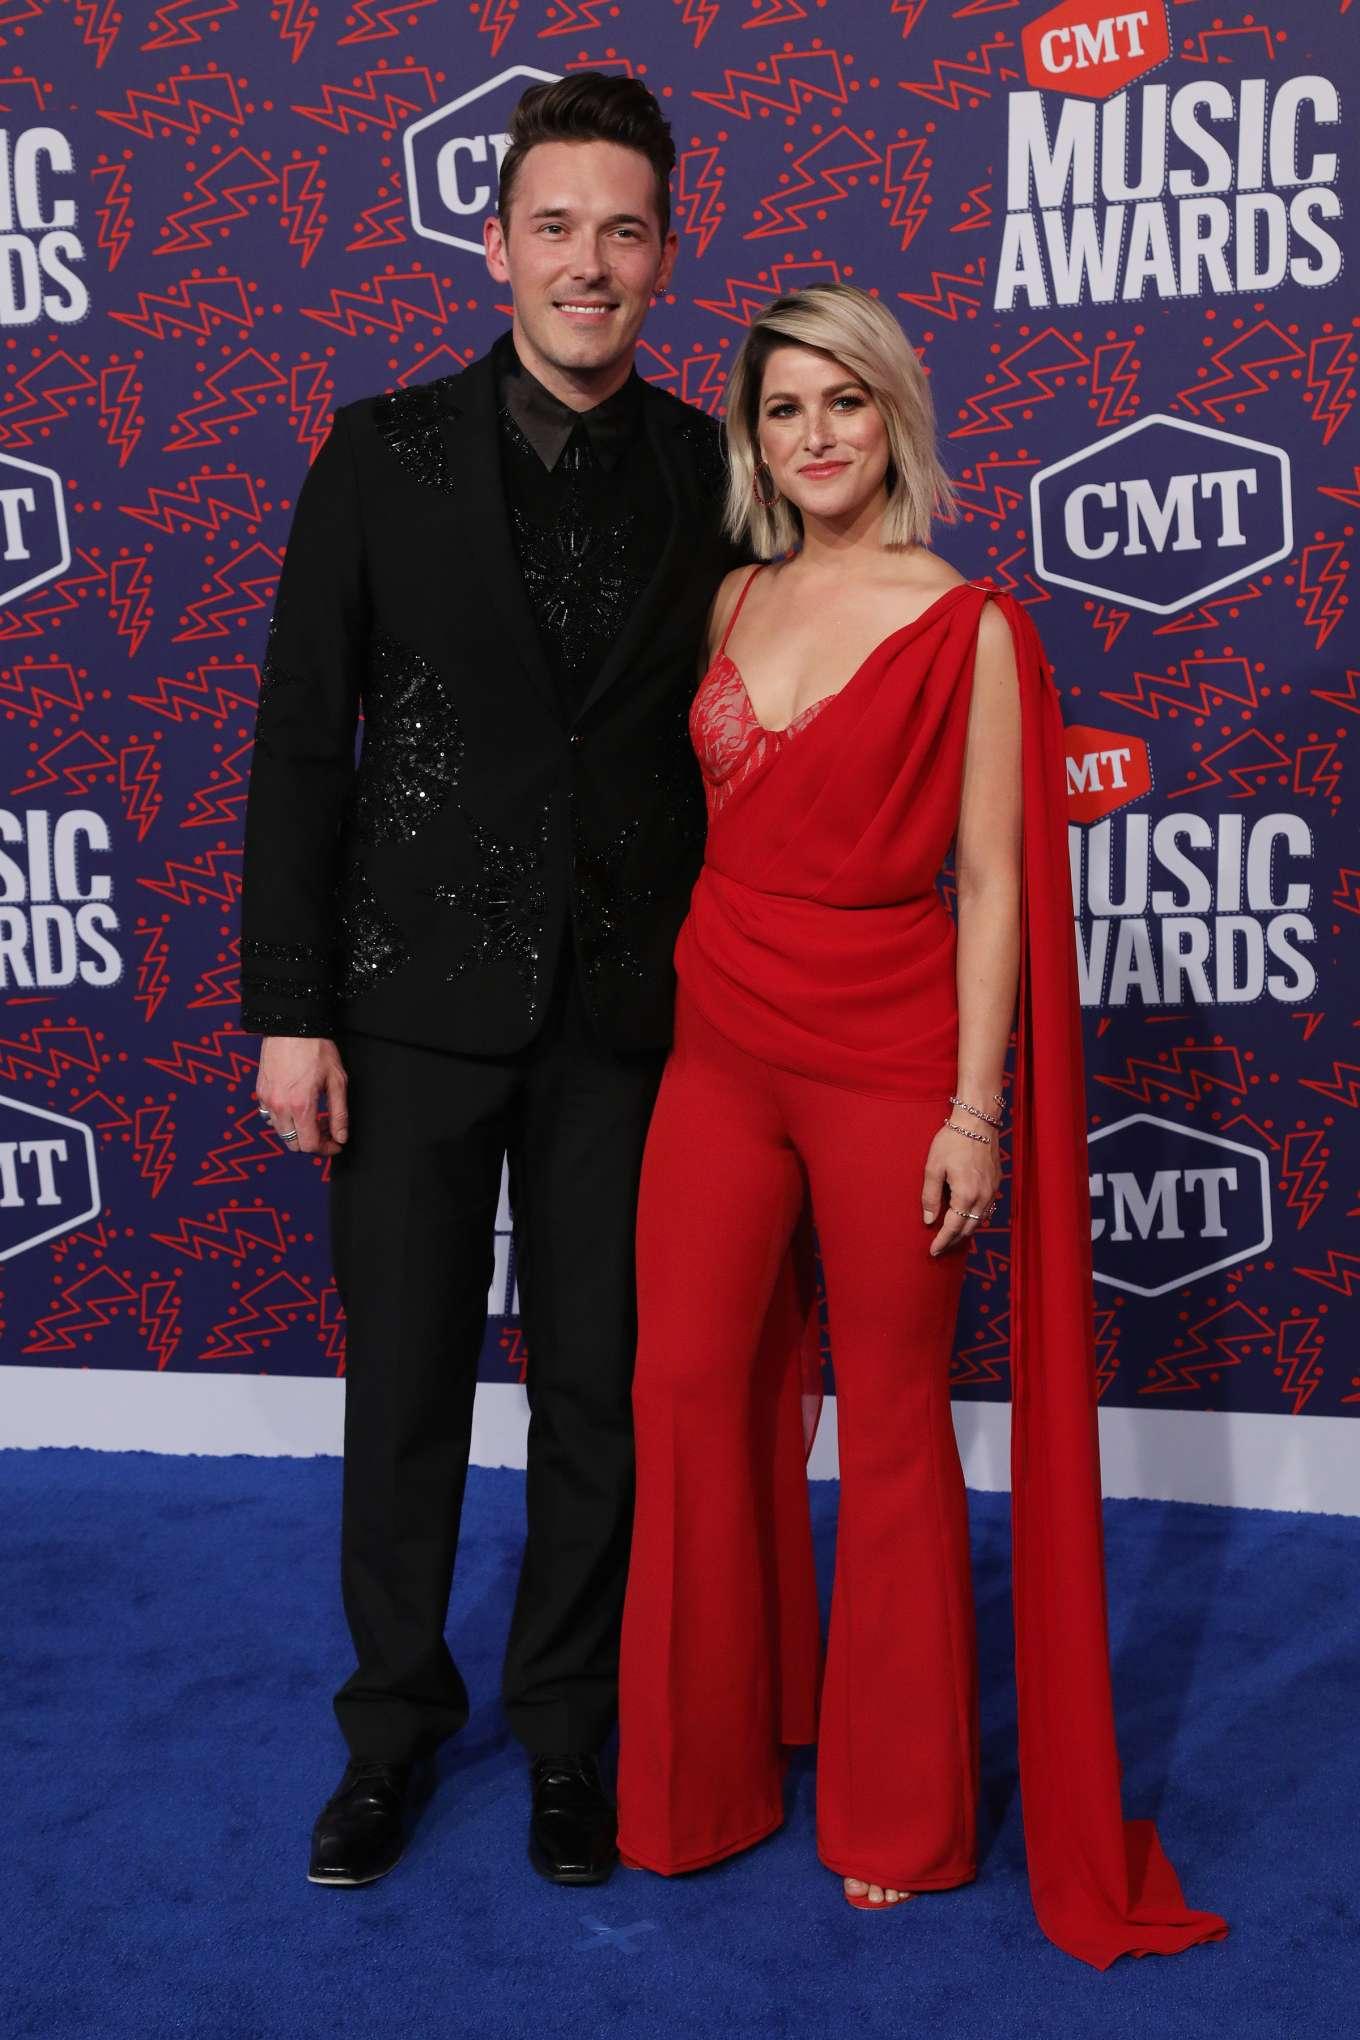 Cassadee Pope 2019 : Cassadee Pope: 2019 CMT Music Awards-34